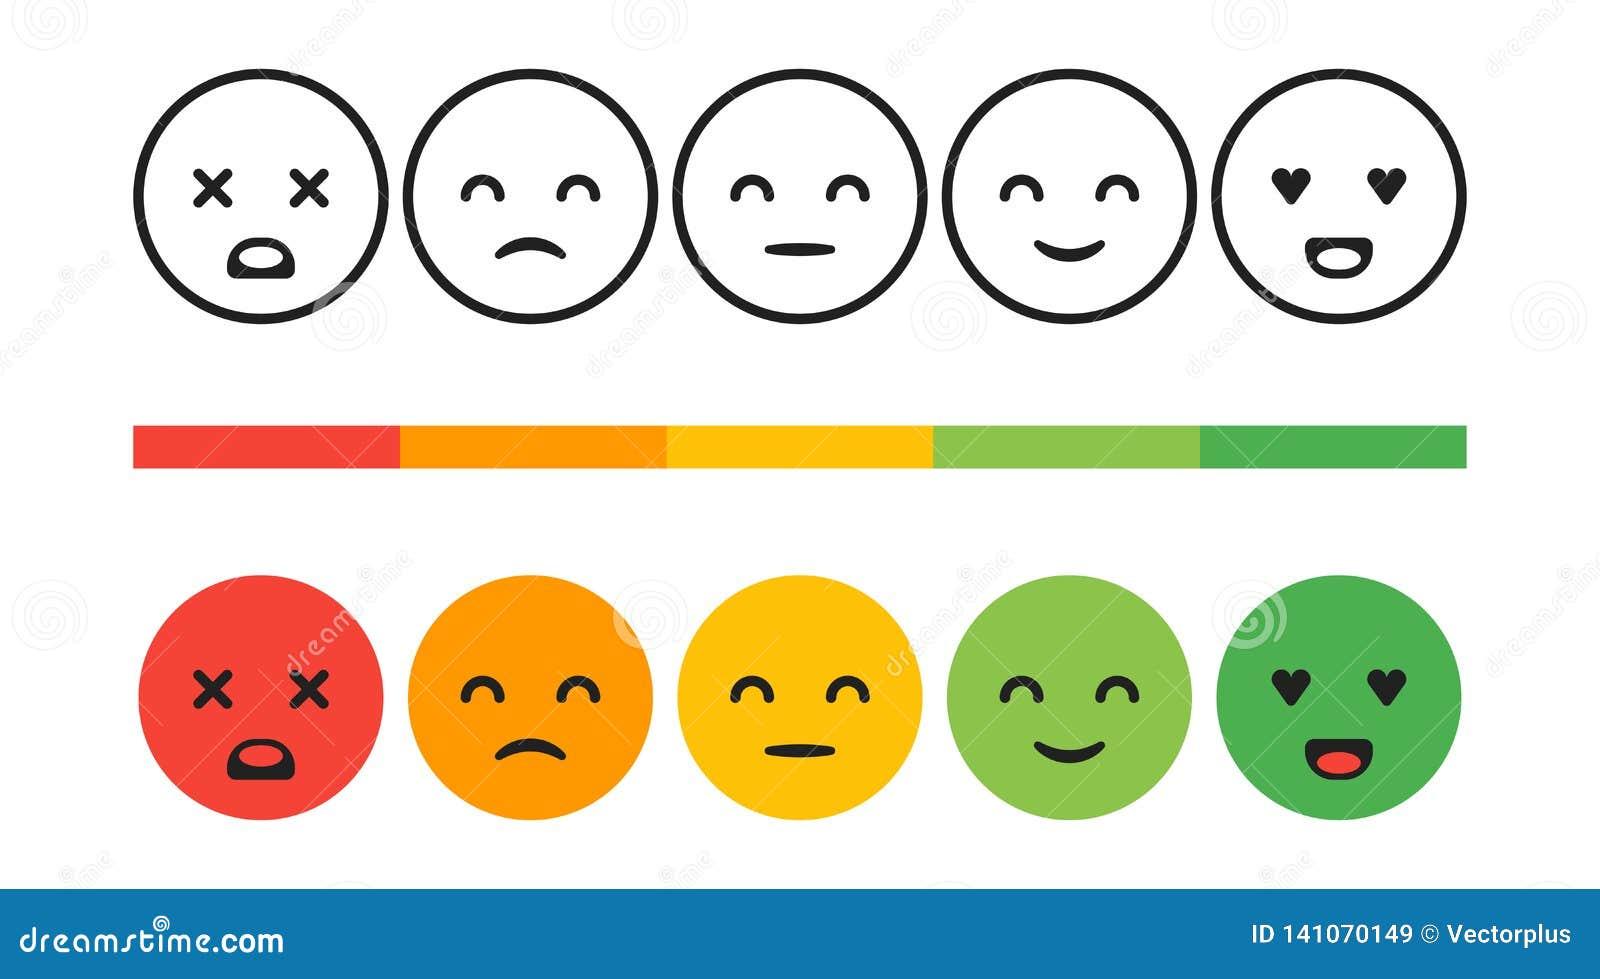 Visage Note Smiley Stock Illustrations Vecteurs Clipart 514 Stock Illustrations